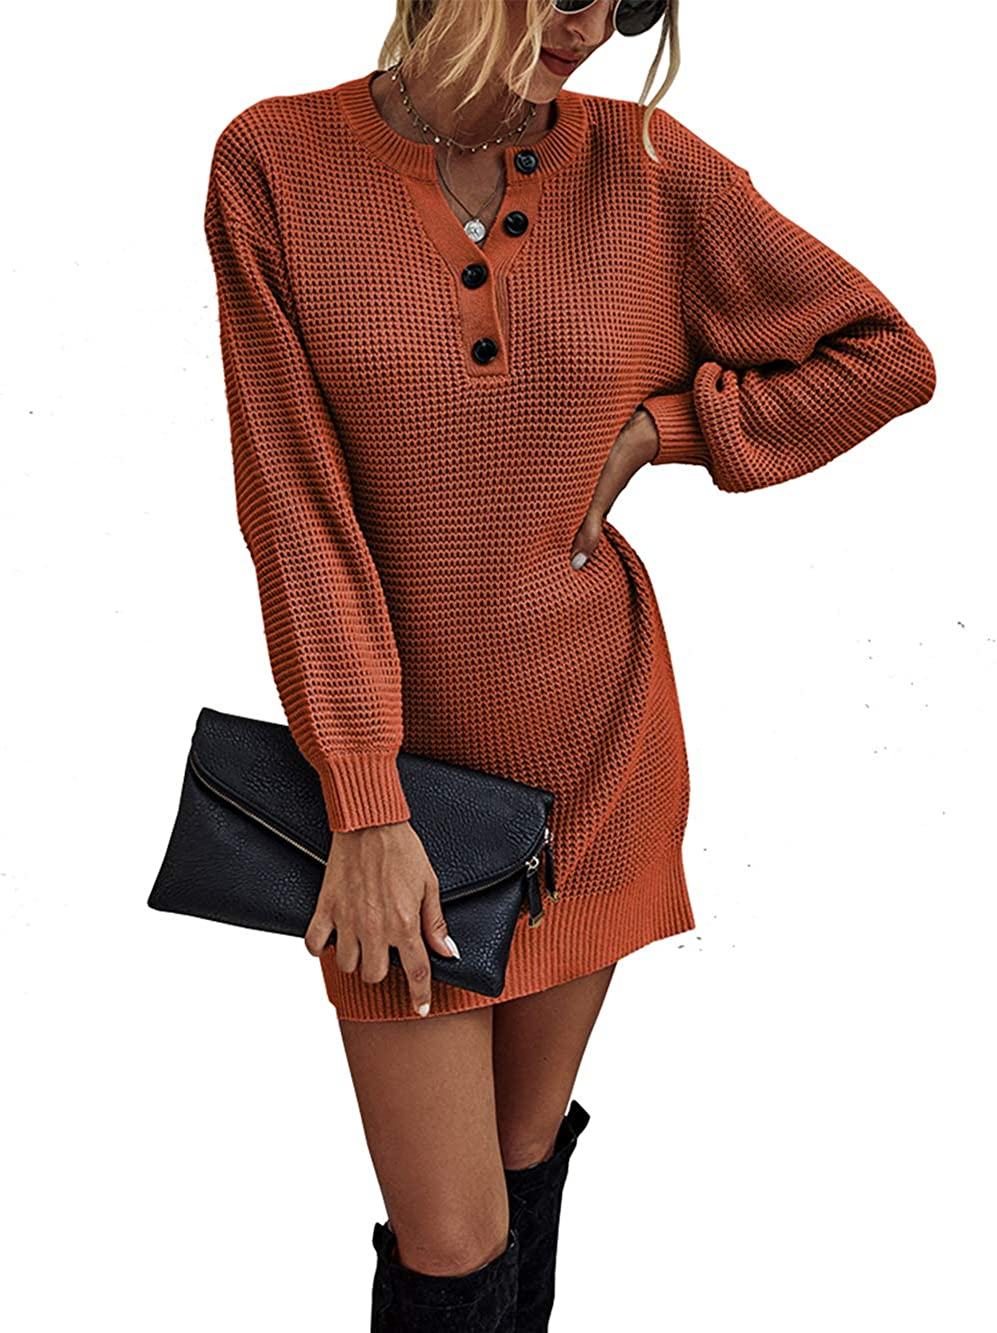 KIRUNDO 2021 Women's Winter Long Sleeve Sweater Dress V Neck Button Henley Long Knit Top Tunic Mini Dress Loose Fit Pullover